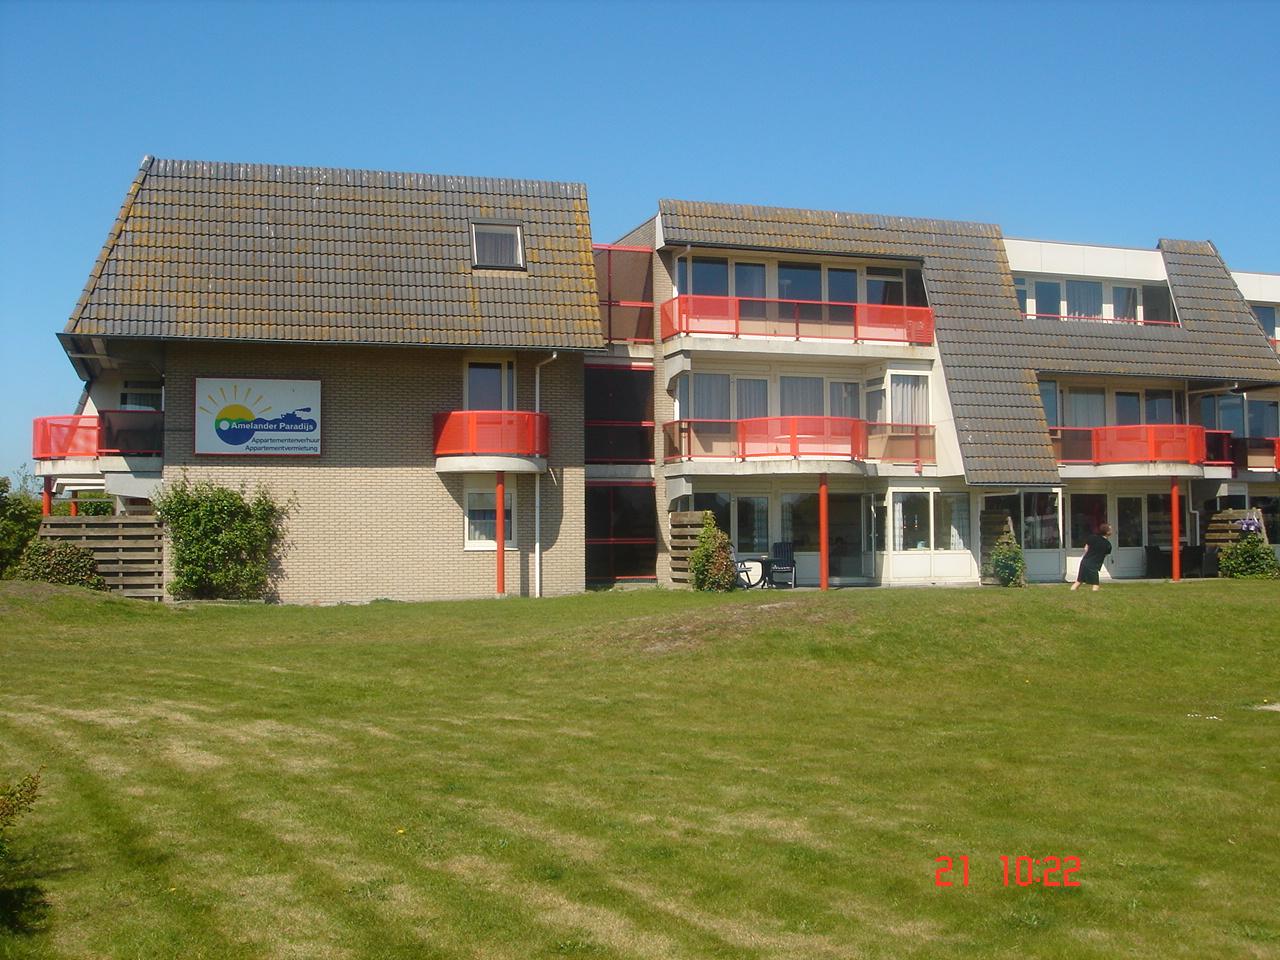 Apartments-BuitendeDuinen1.JPG